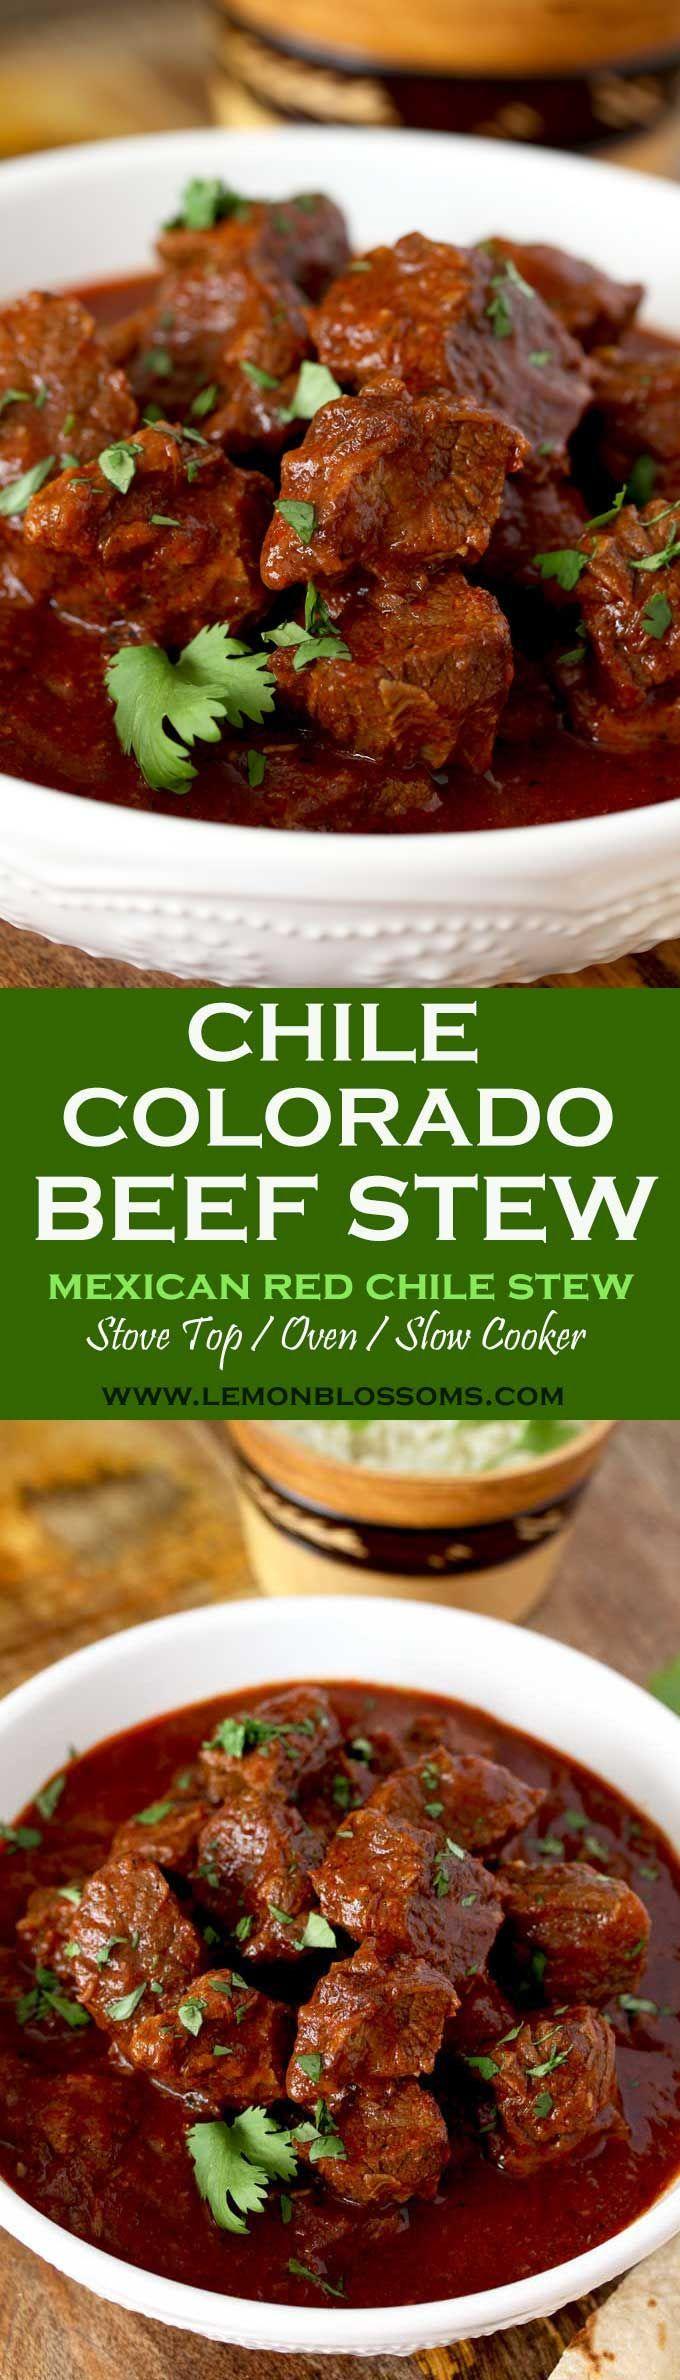 Chile Colorado Beef Stew